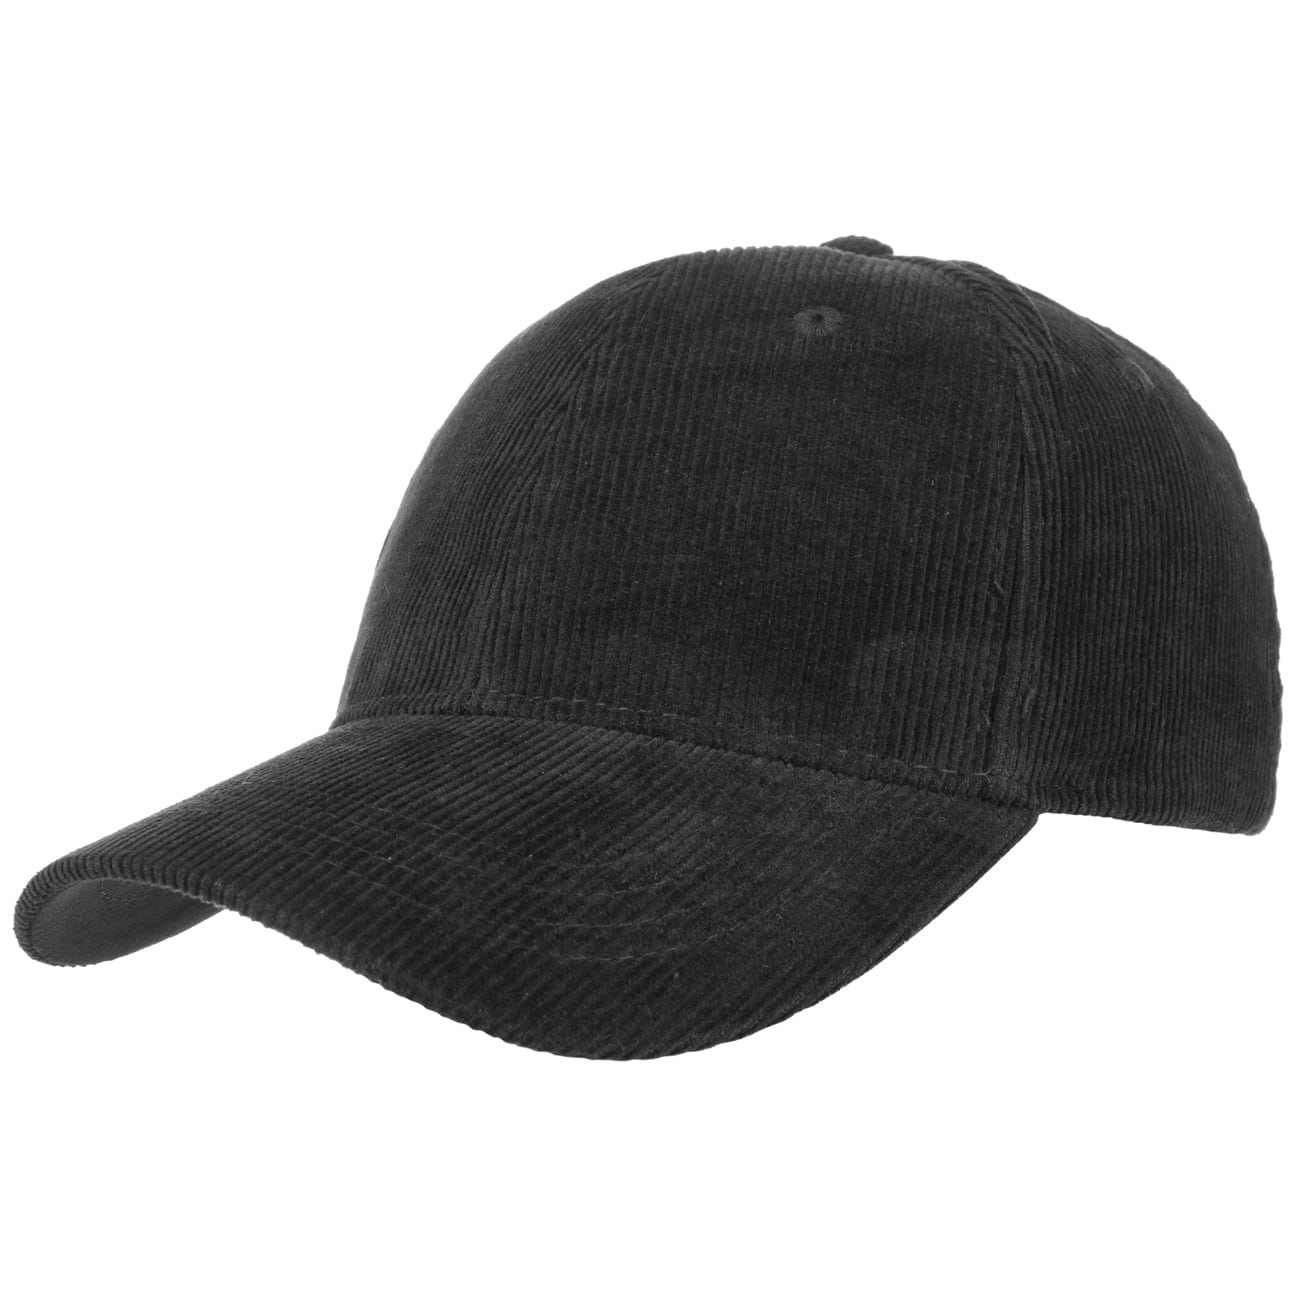 corduroy-baseballcap-by-lipodo-baumwollcap